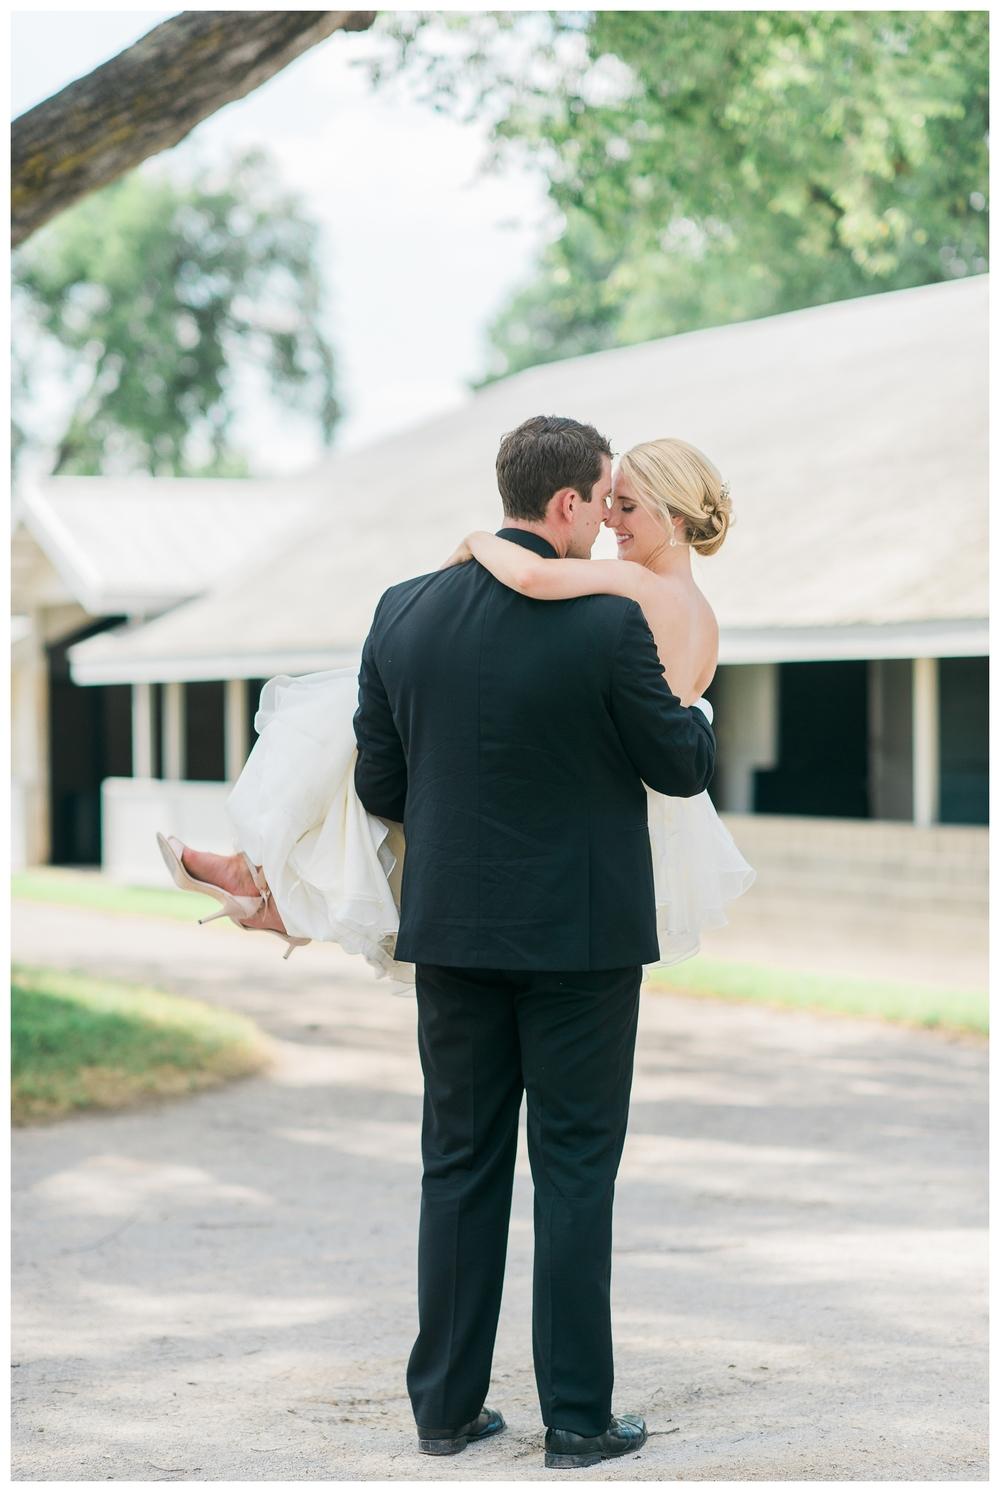 Rebecca_Bridges_Photography_Indianapolis_Wedding_Photographer_4560.jpg